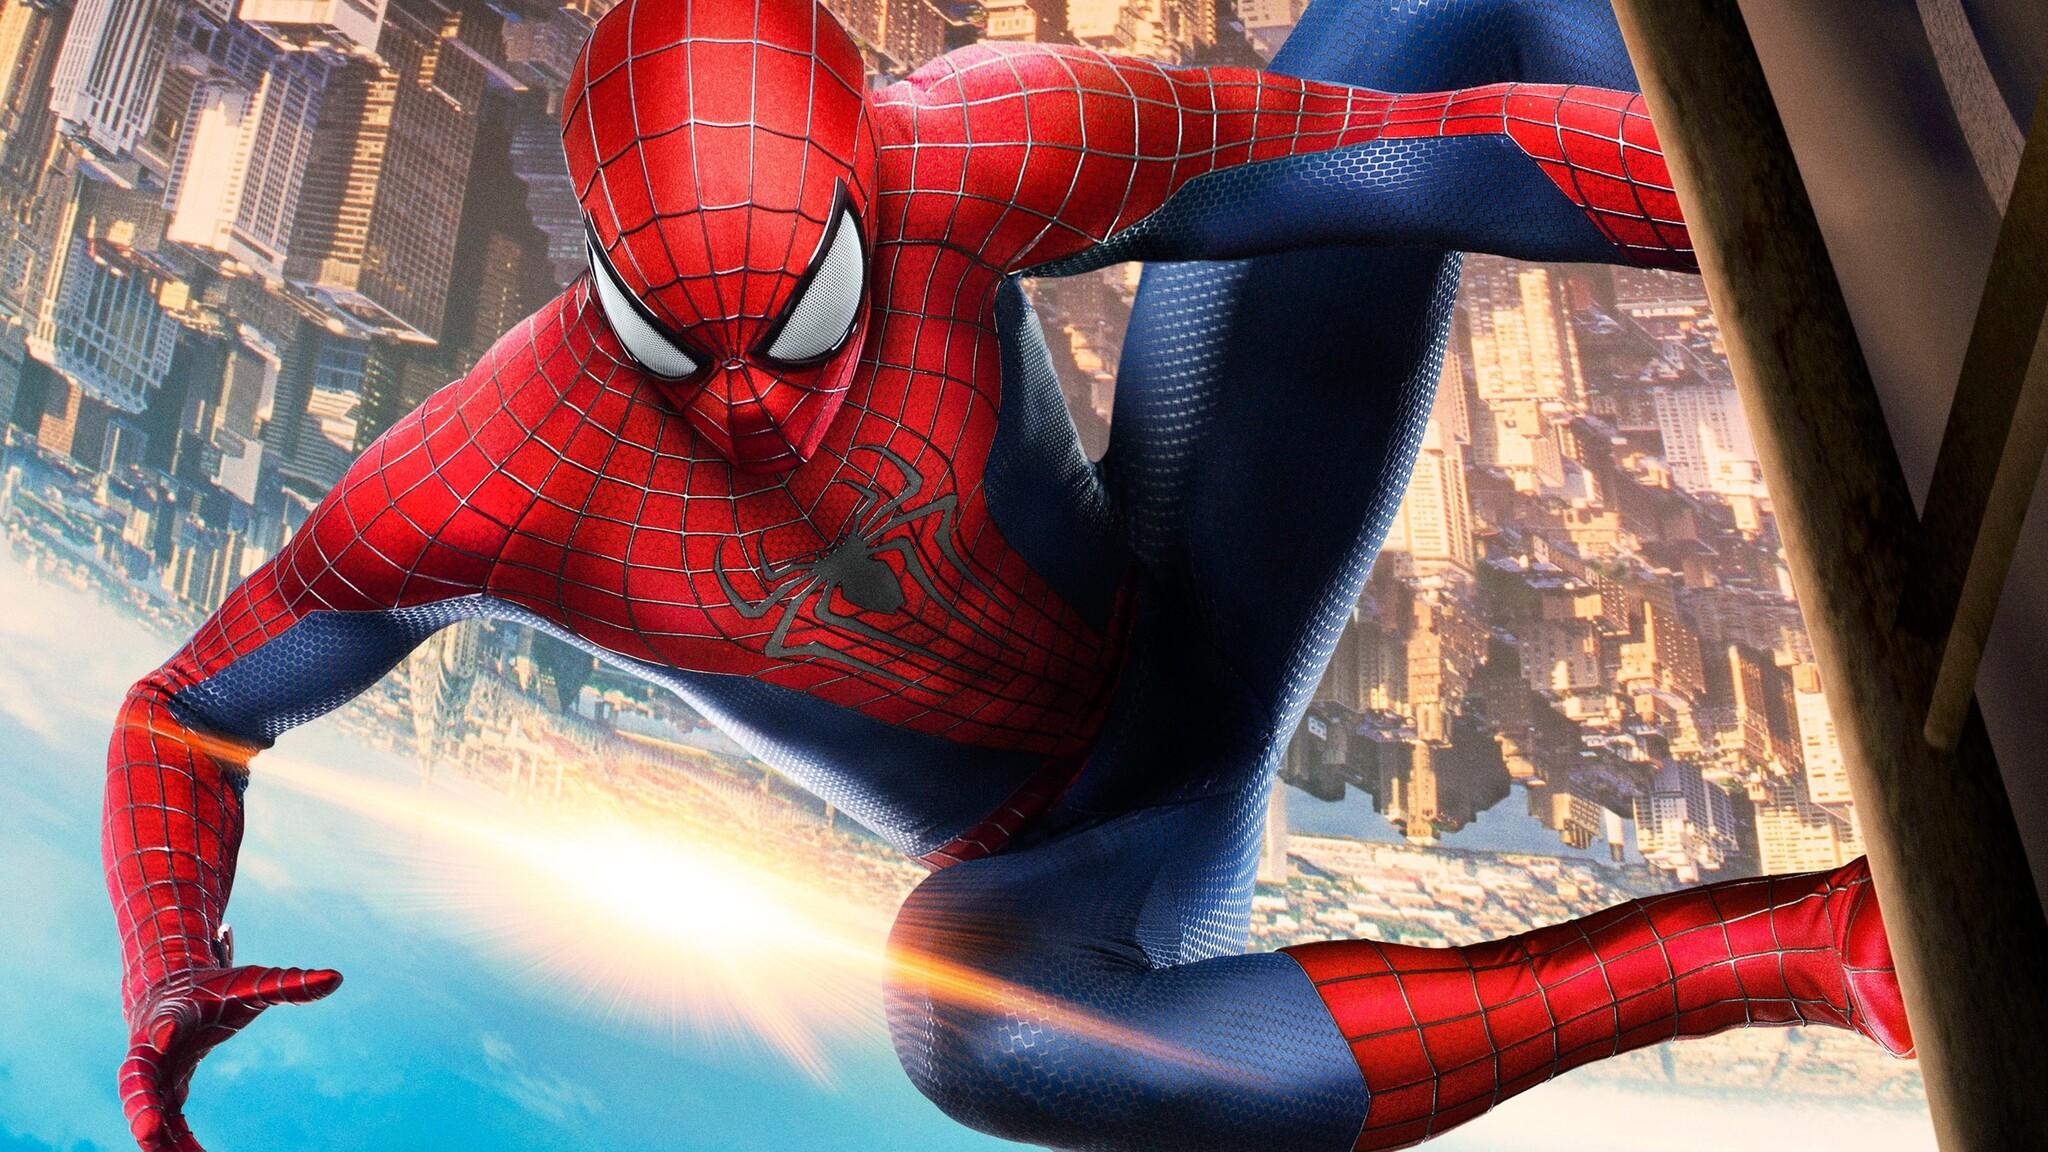 2048x1152 The Amazing Spider Man 2 2048x1152 Resolution Hd 4k